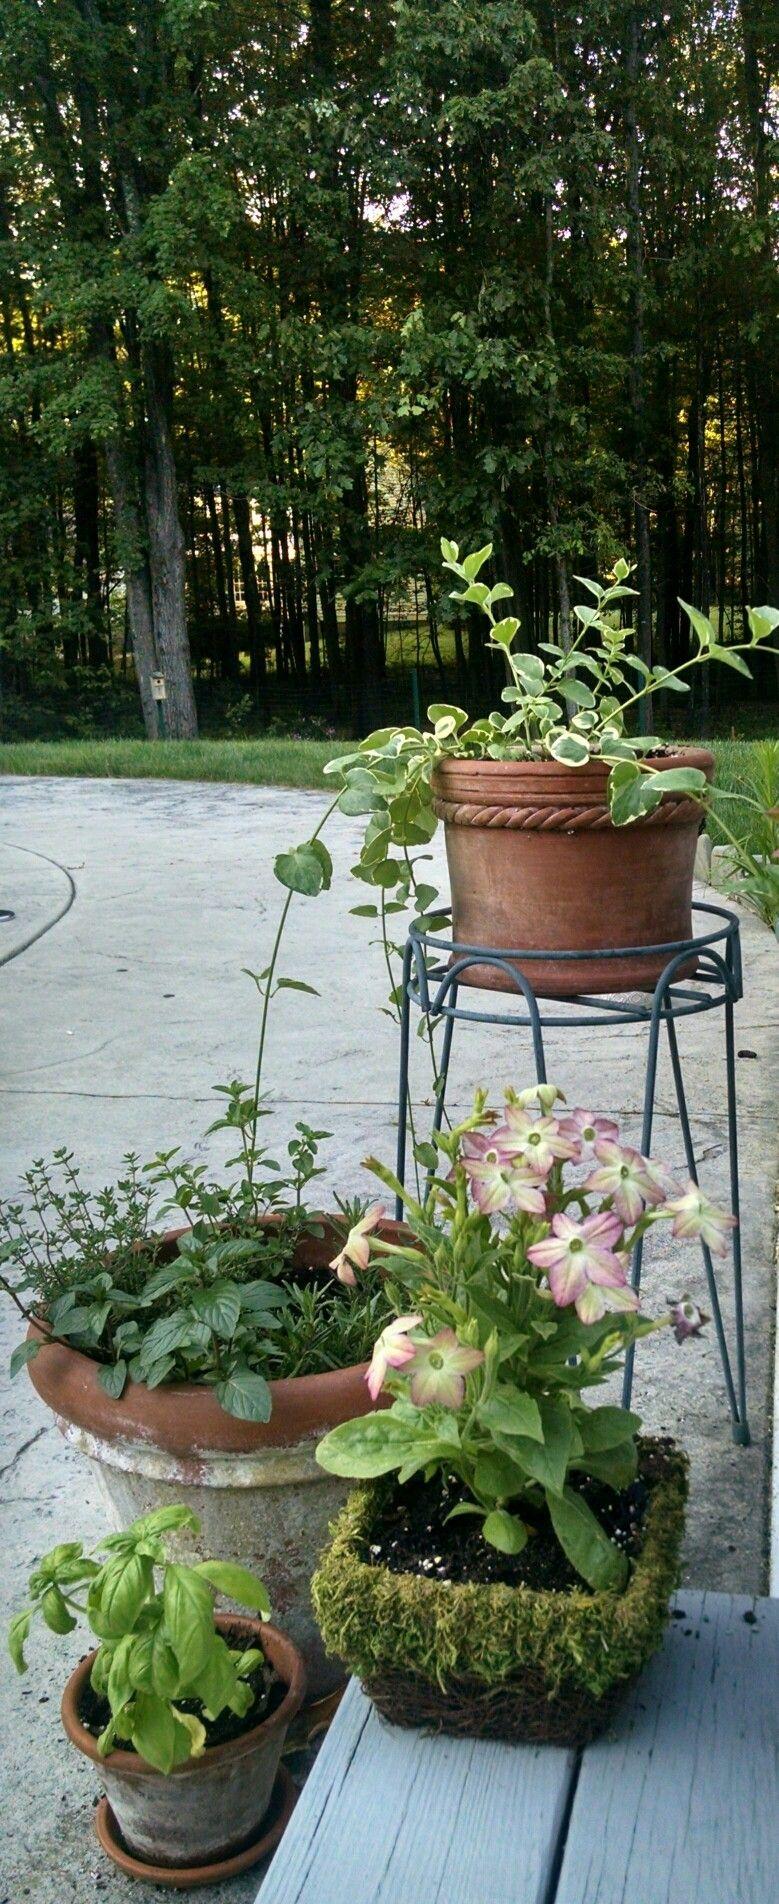 Nicotiana and herbs